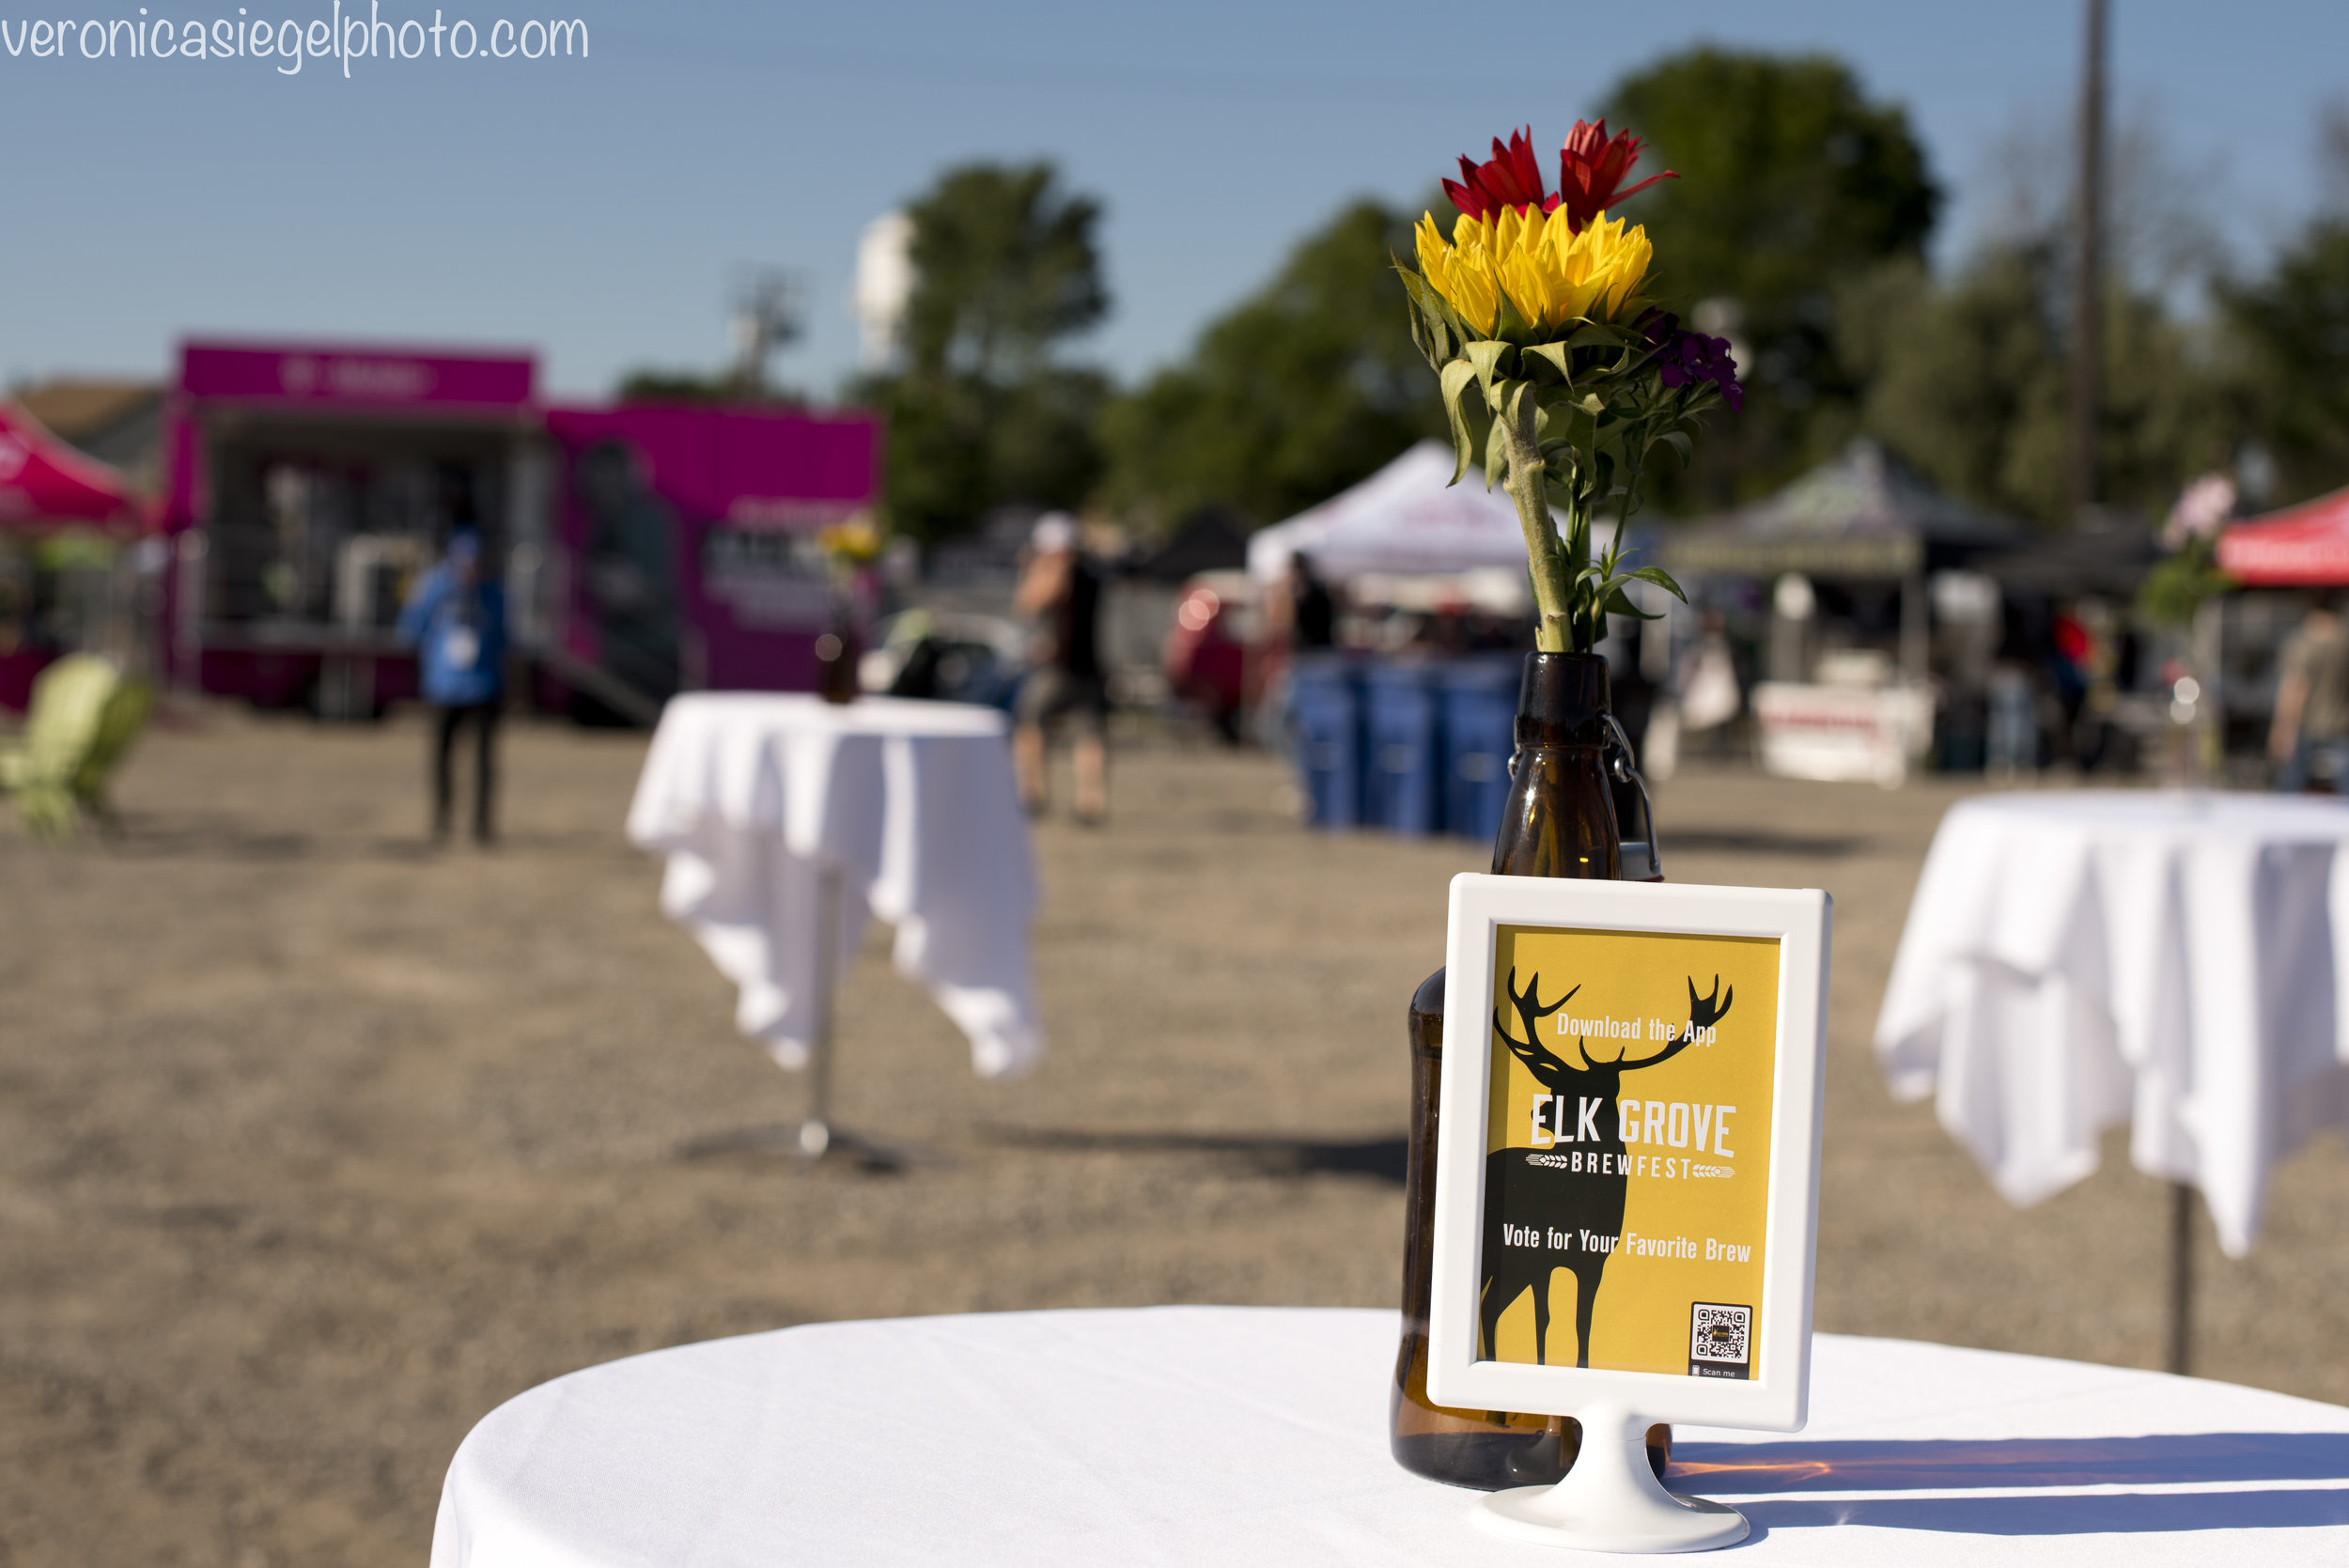 Elk Grove Brewfest 2019